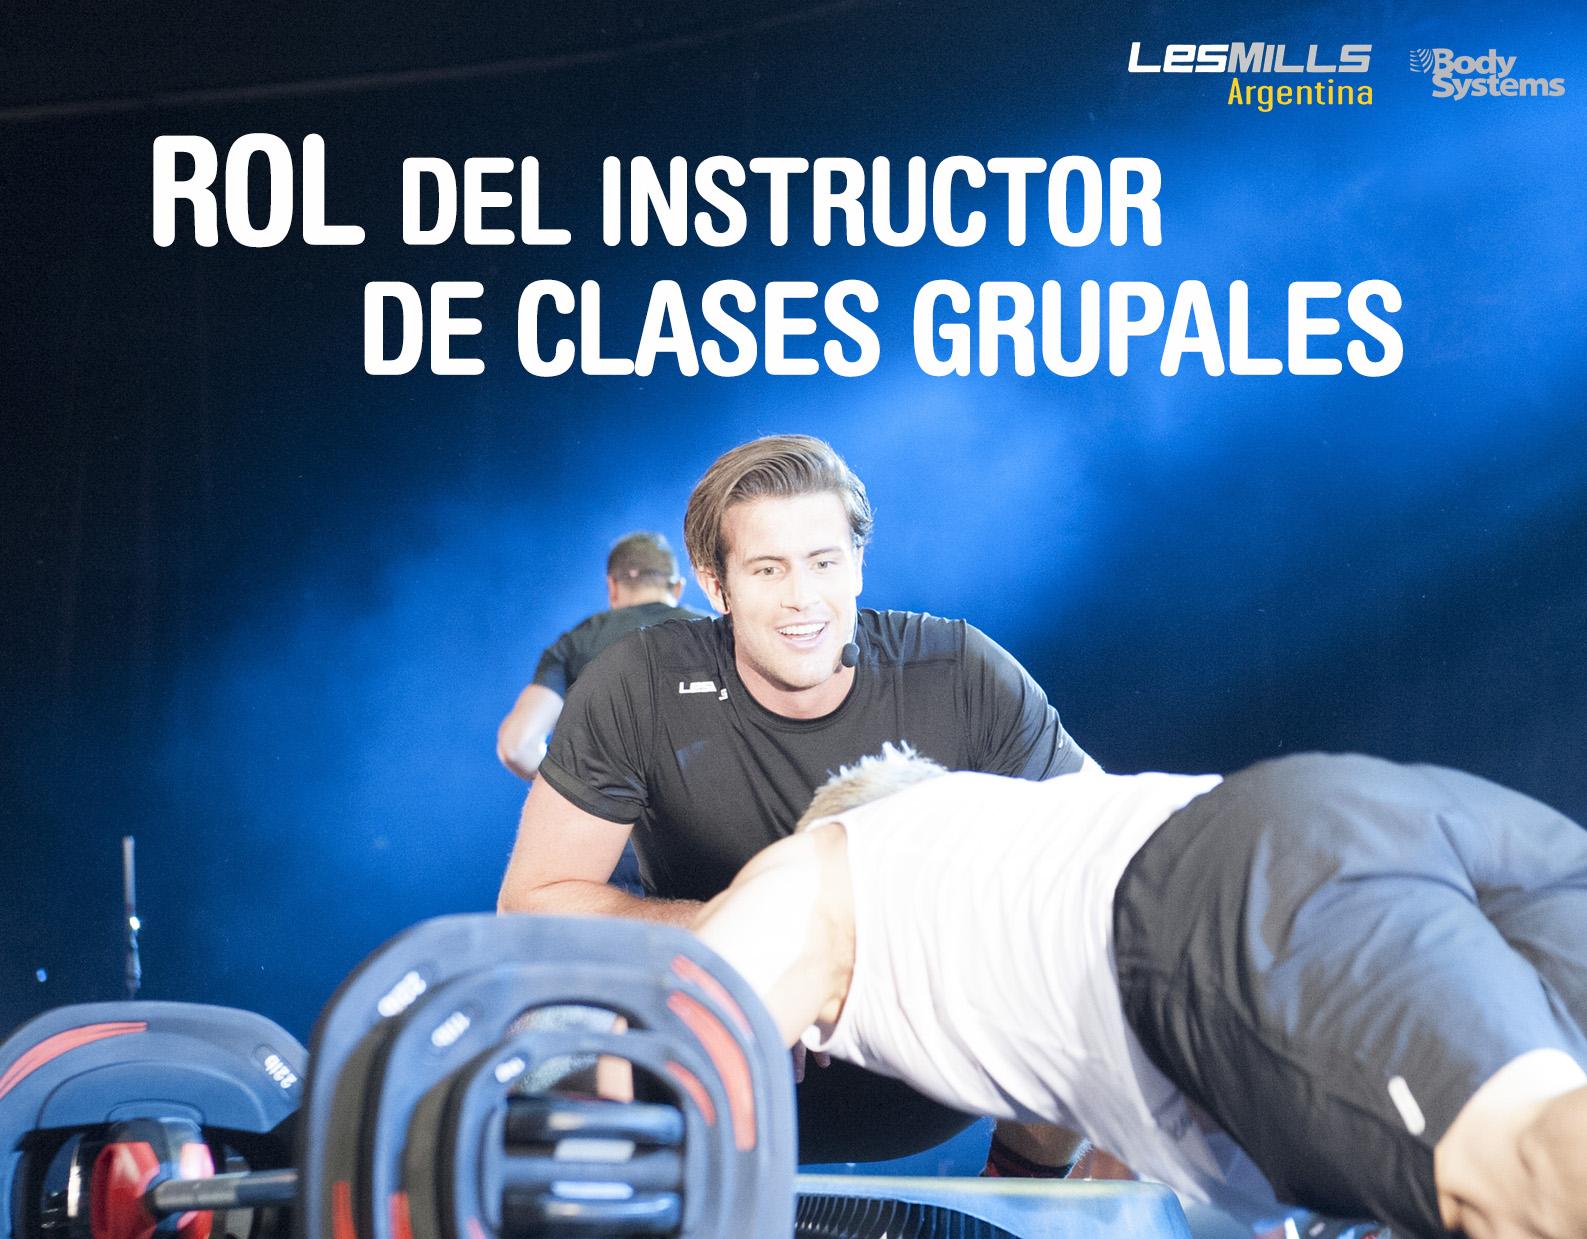 Rol del instructor de clases grupales